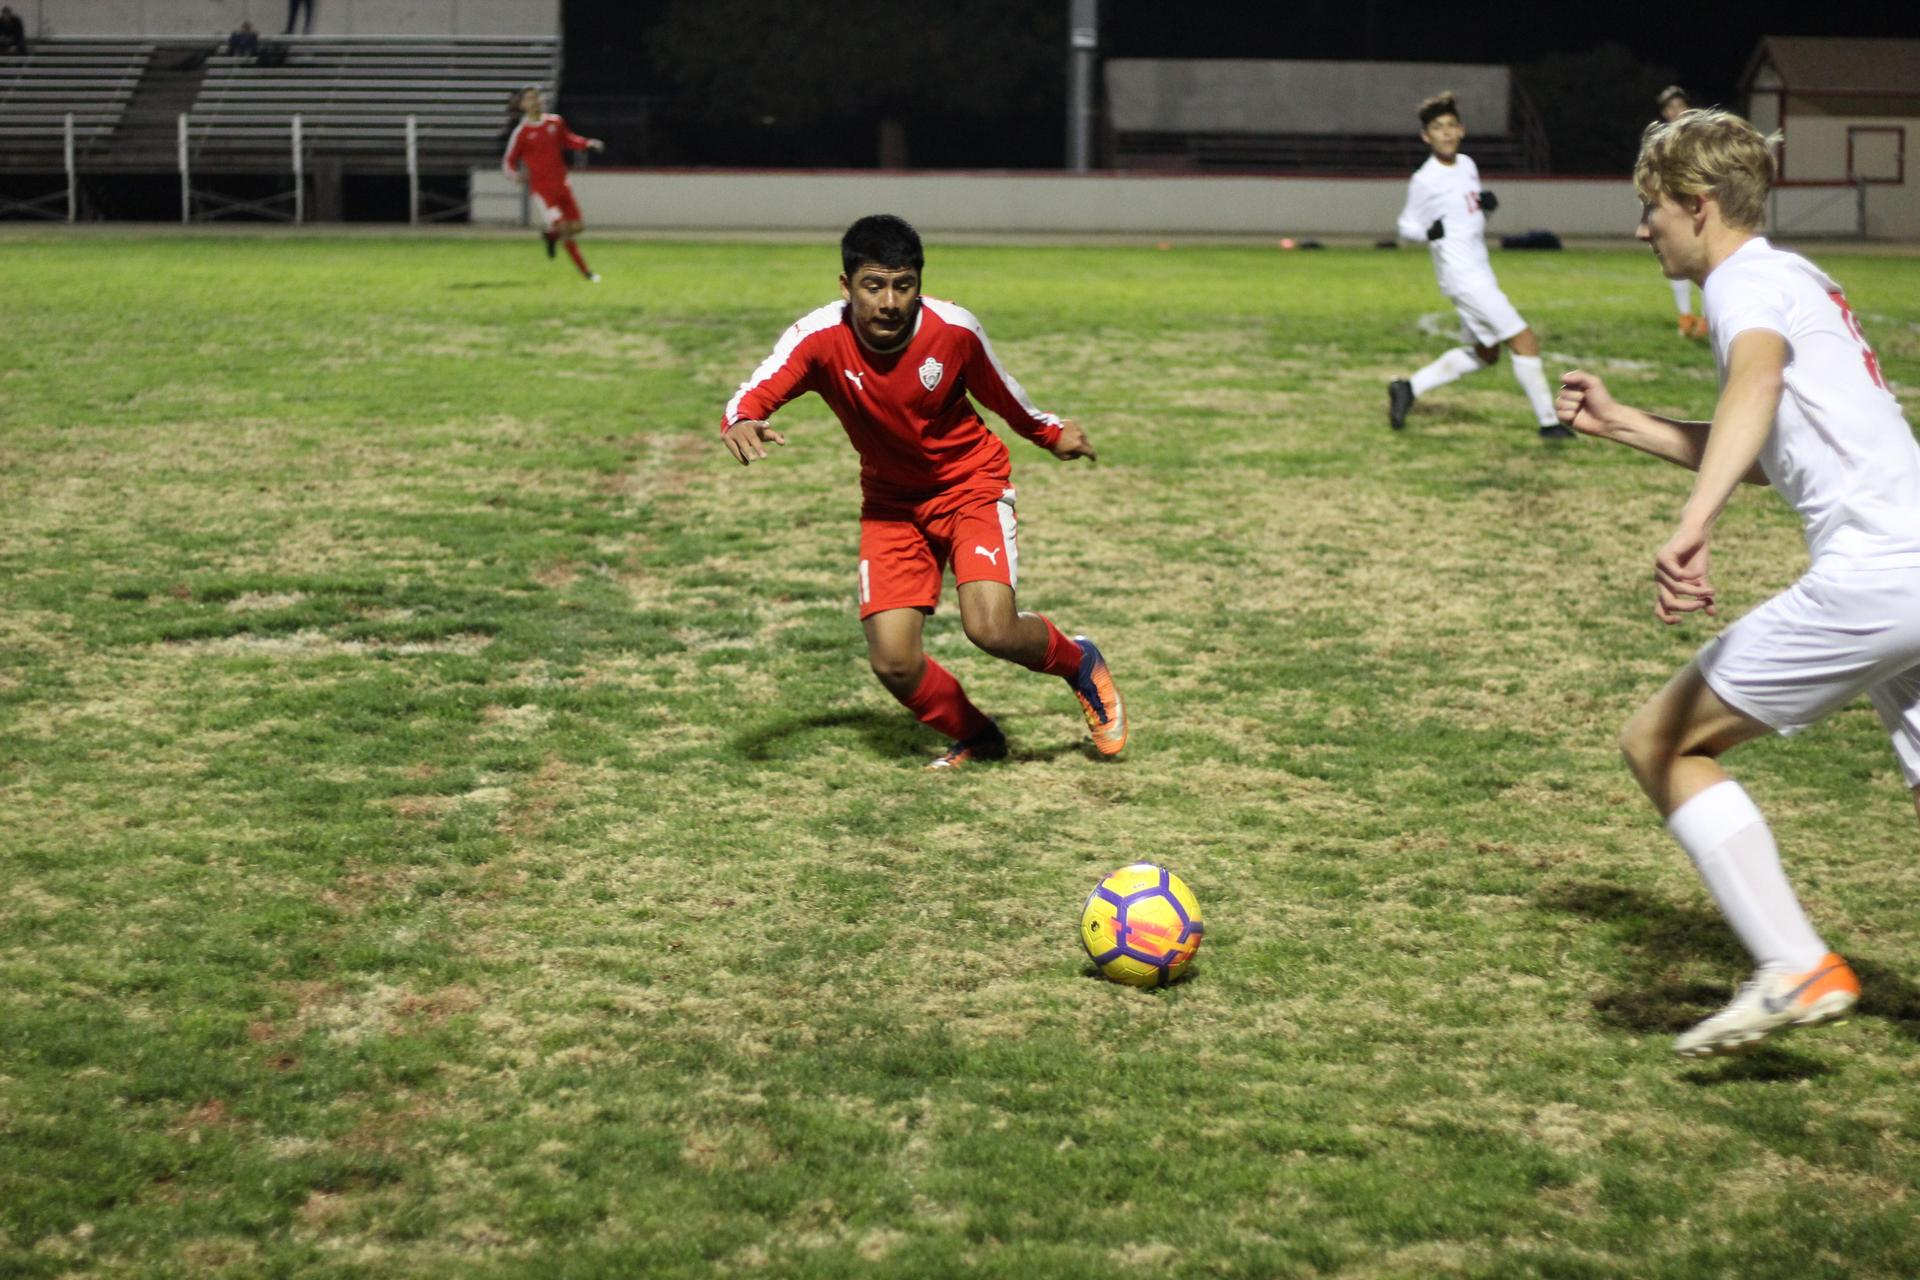 Cristobal Galvan running after the ball